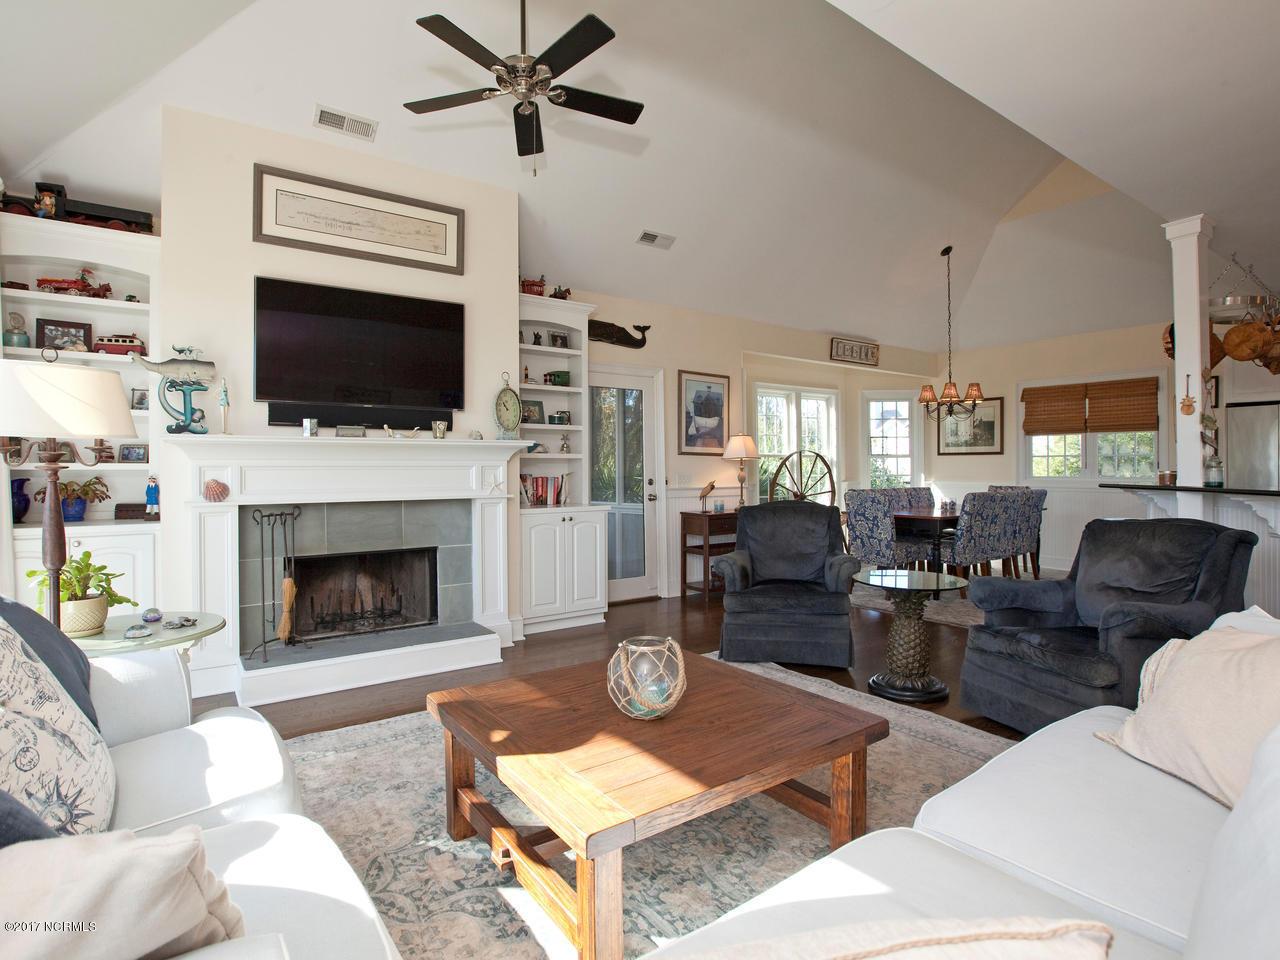 2821 Shandy Avenue- Wilmington- North Carolina 28409, 4 Bedrooms Bedrooms, 14 Rooms Rooms,4 BathroomsBathrooms,Residential,For Sale,Shandy,100090665